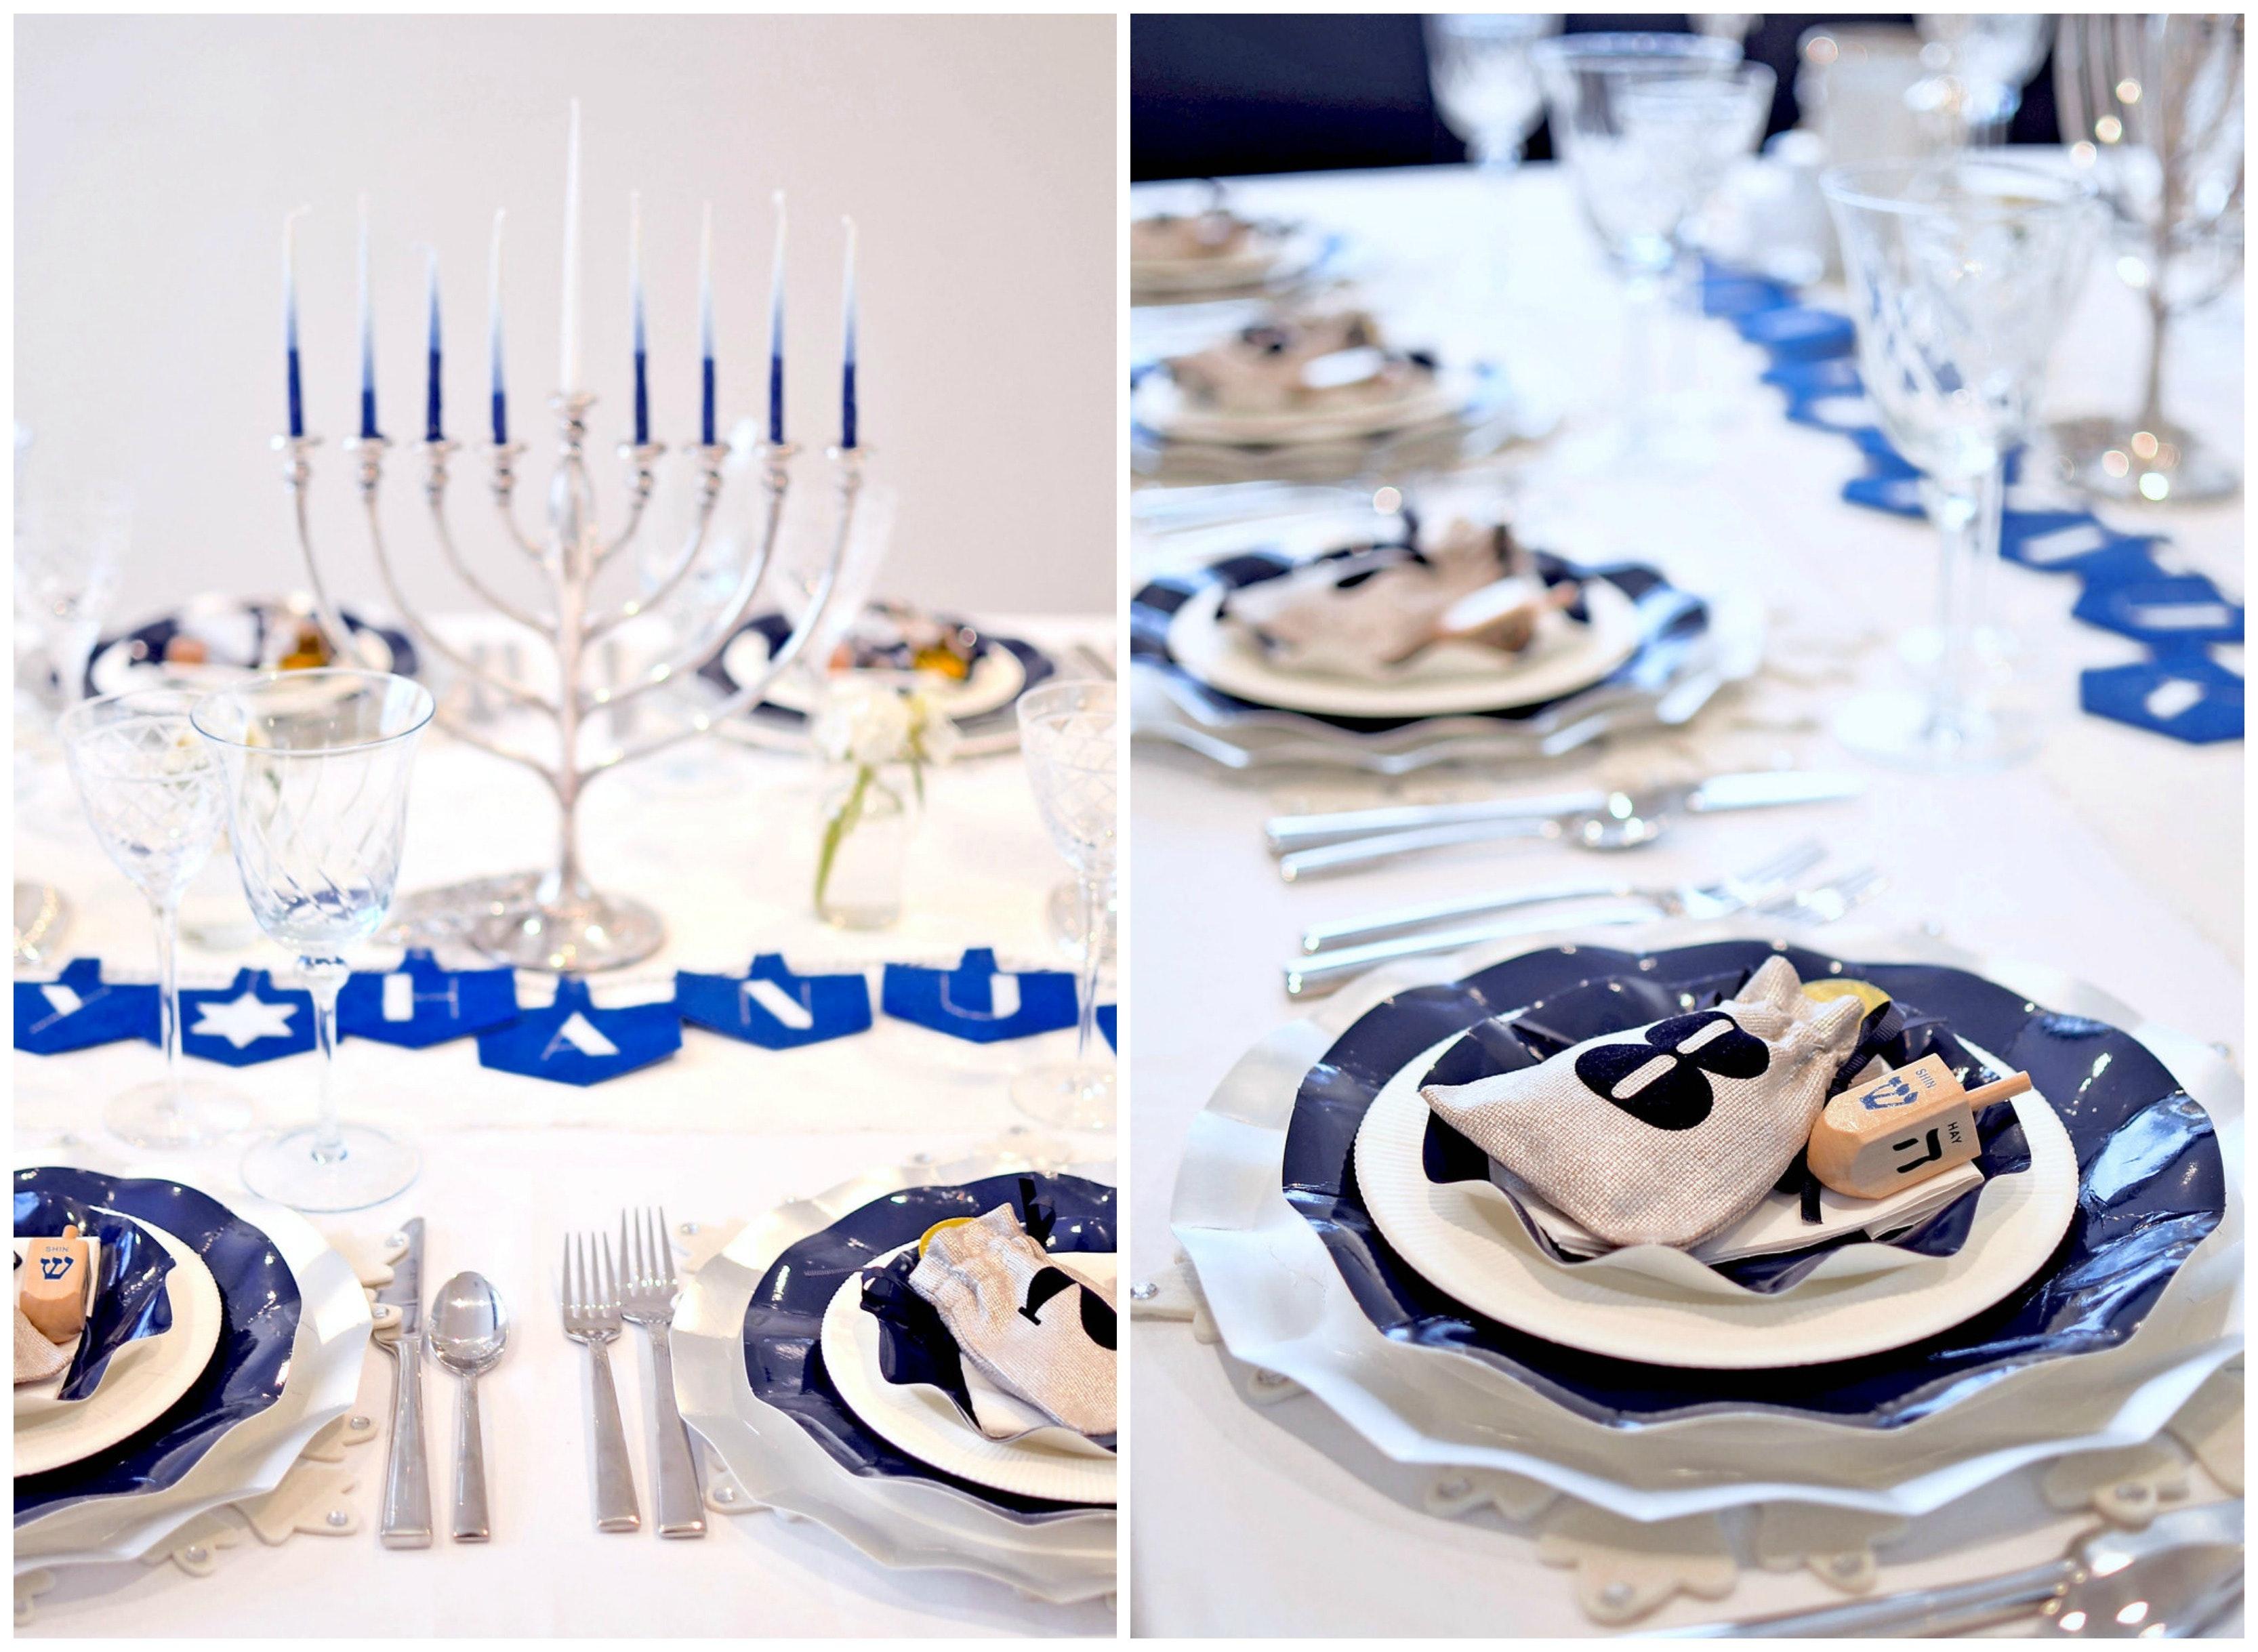 Hanukkah Collage 4